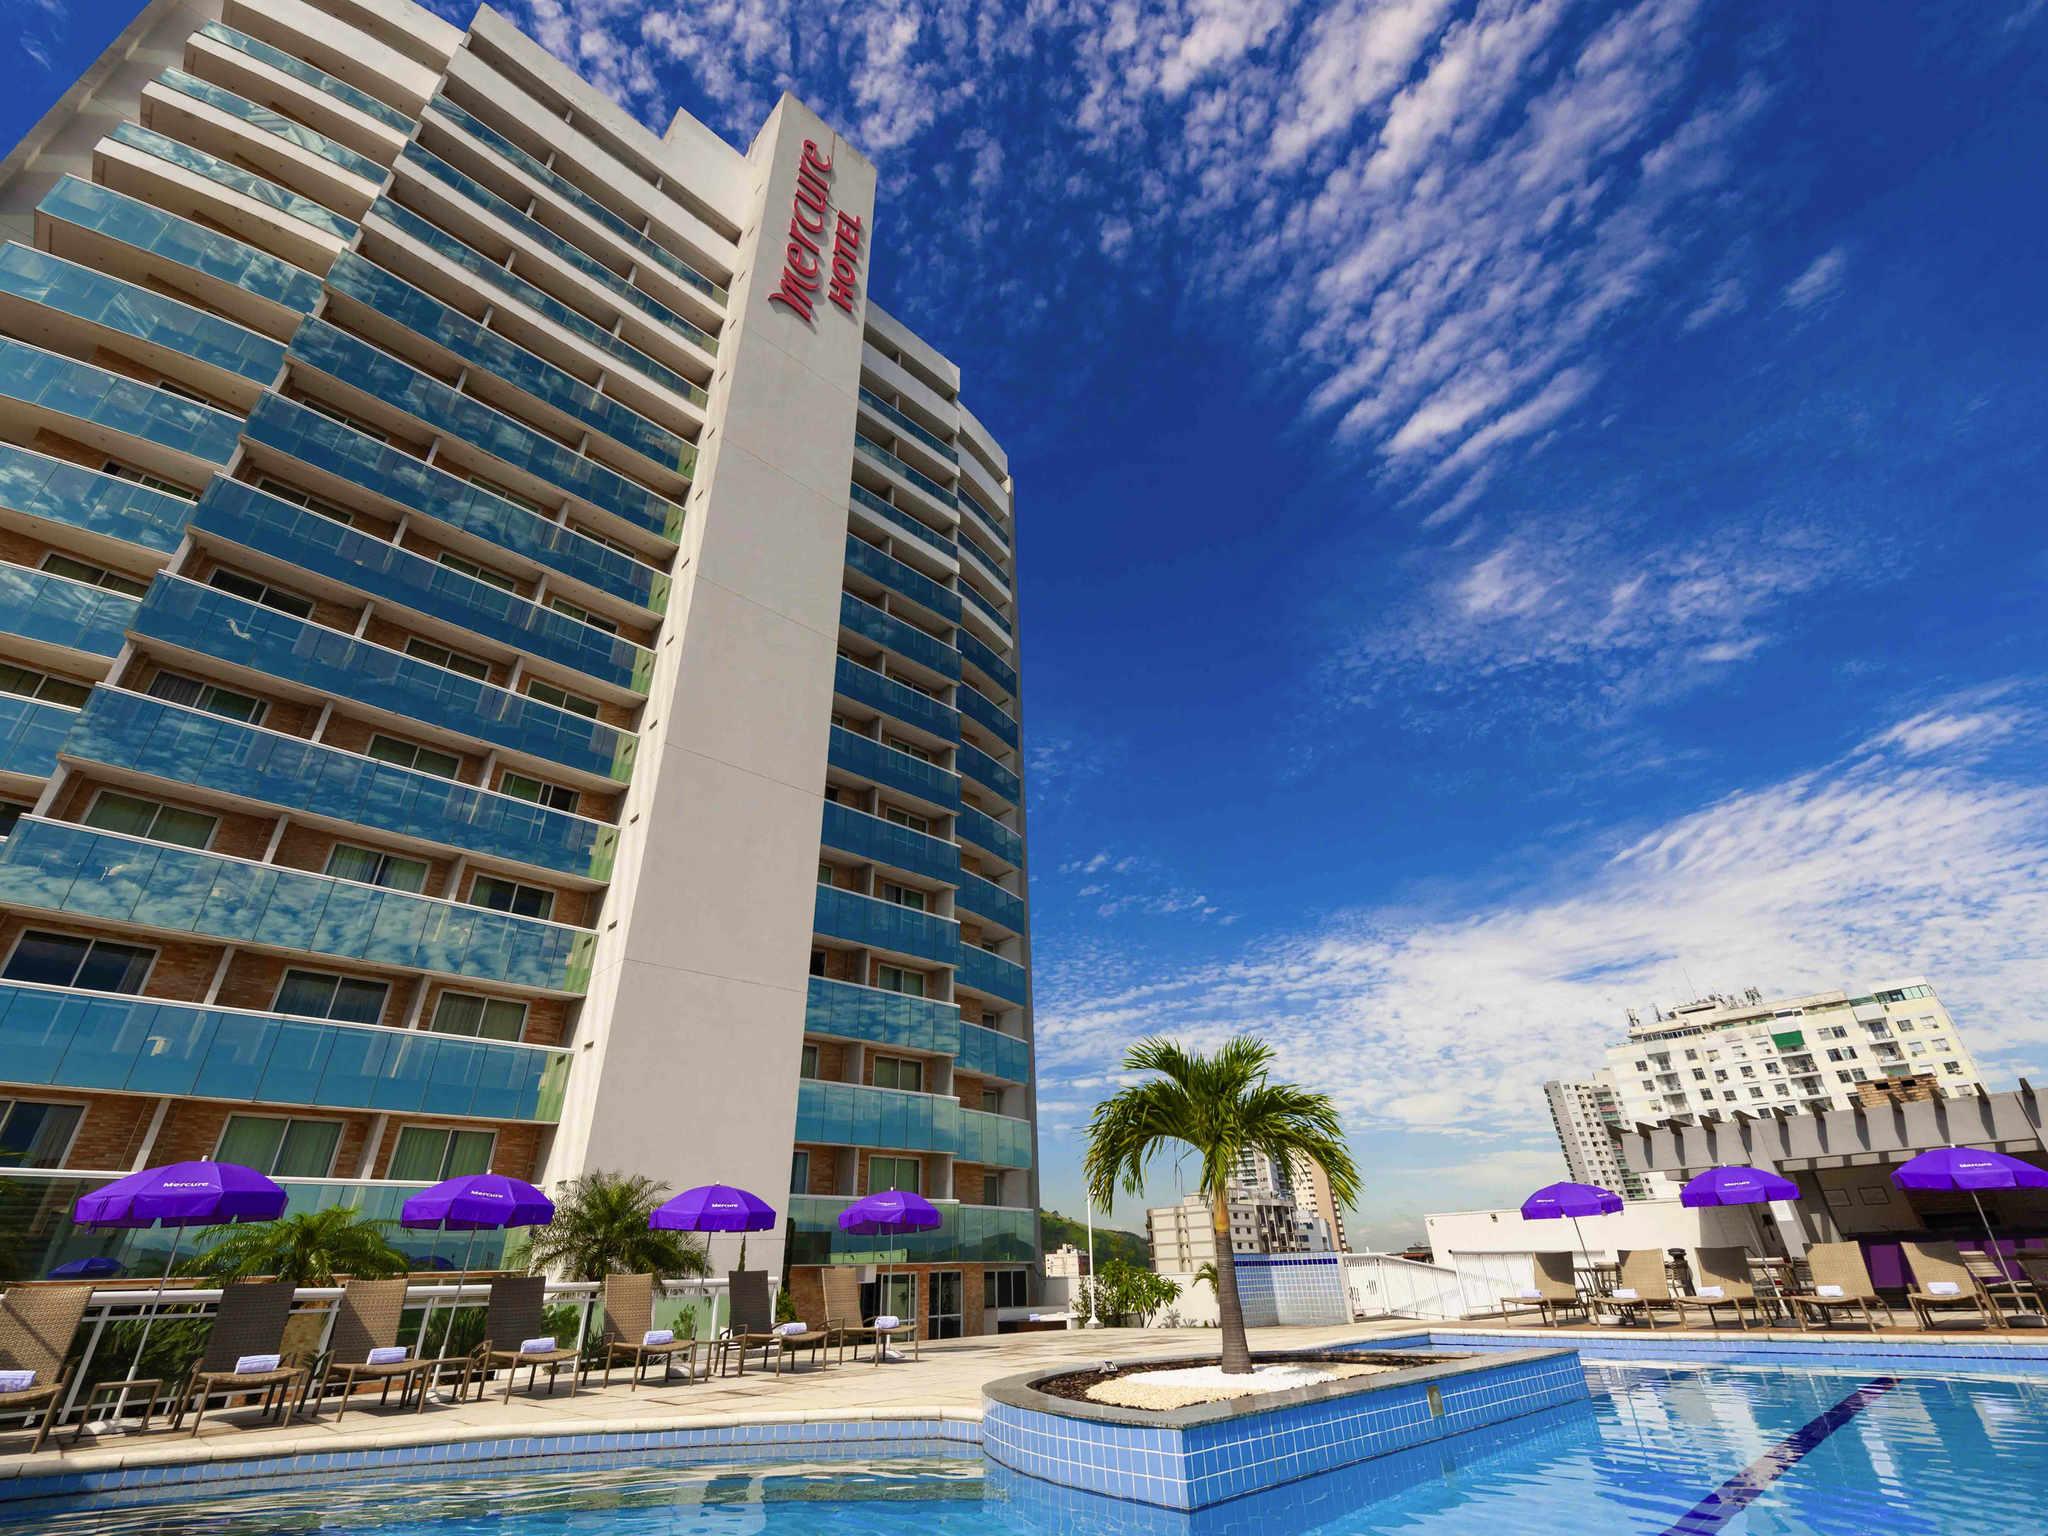 Отель — Mercure Rio de Janeiro Nova Iguacu Hotel